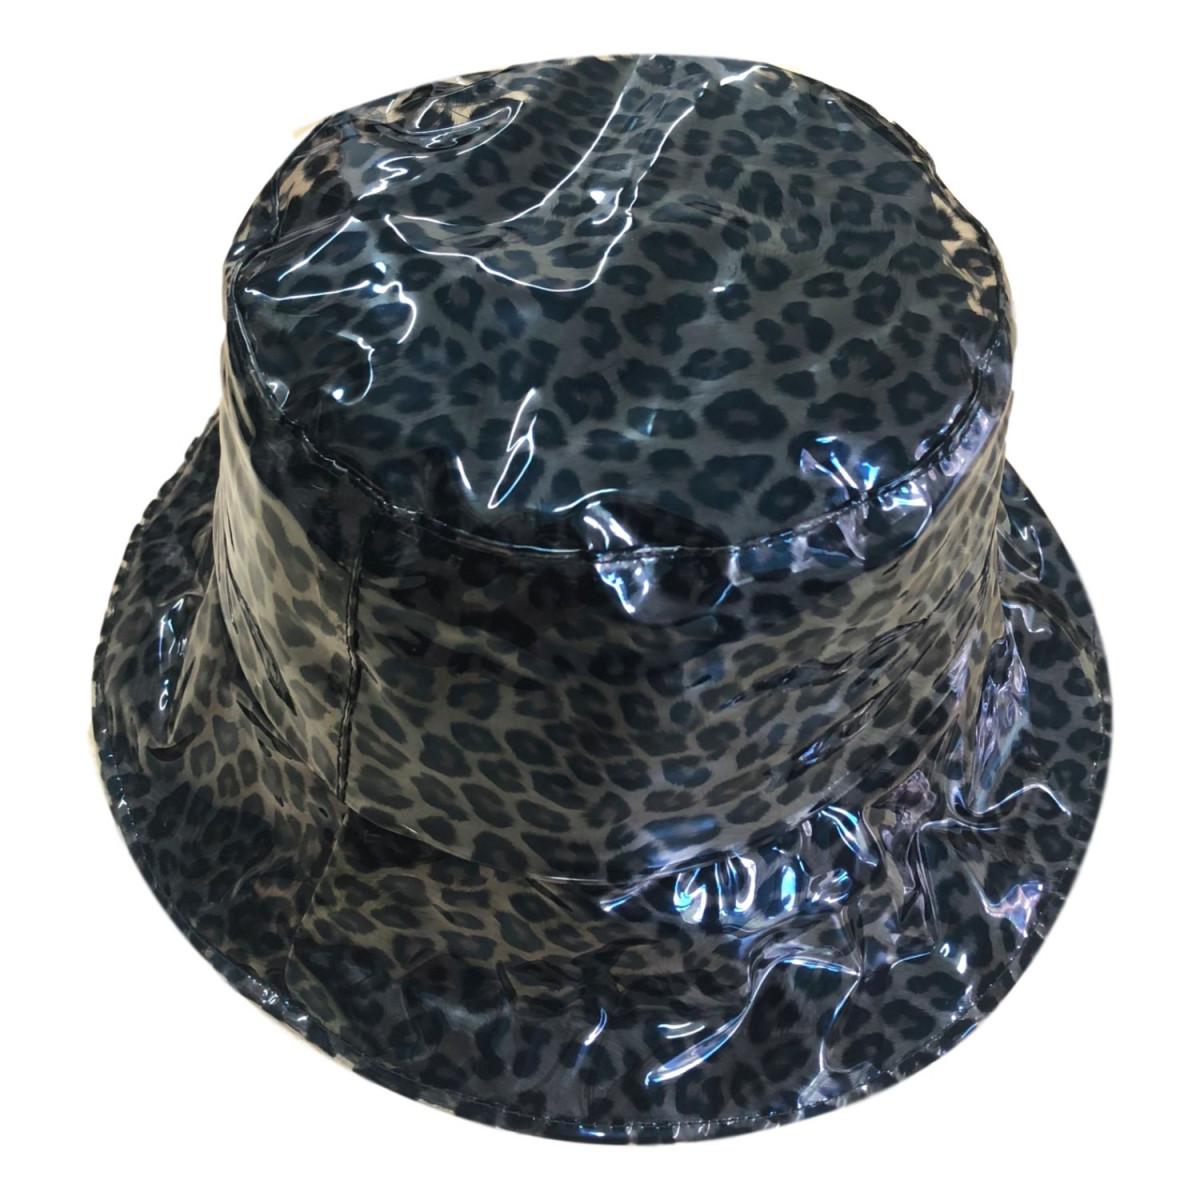 Leopard rain hat